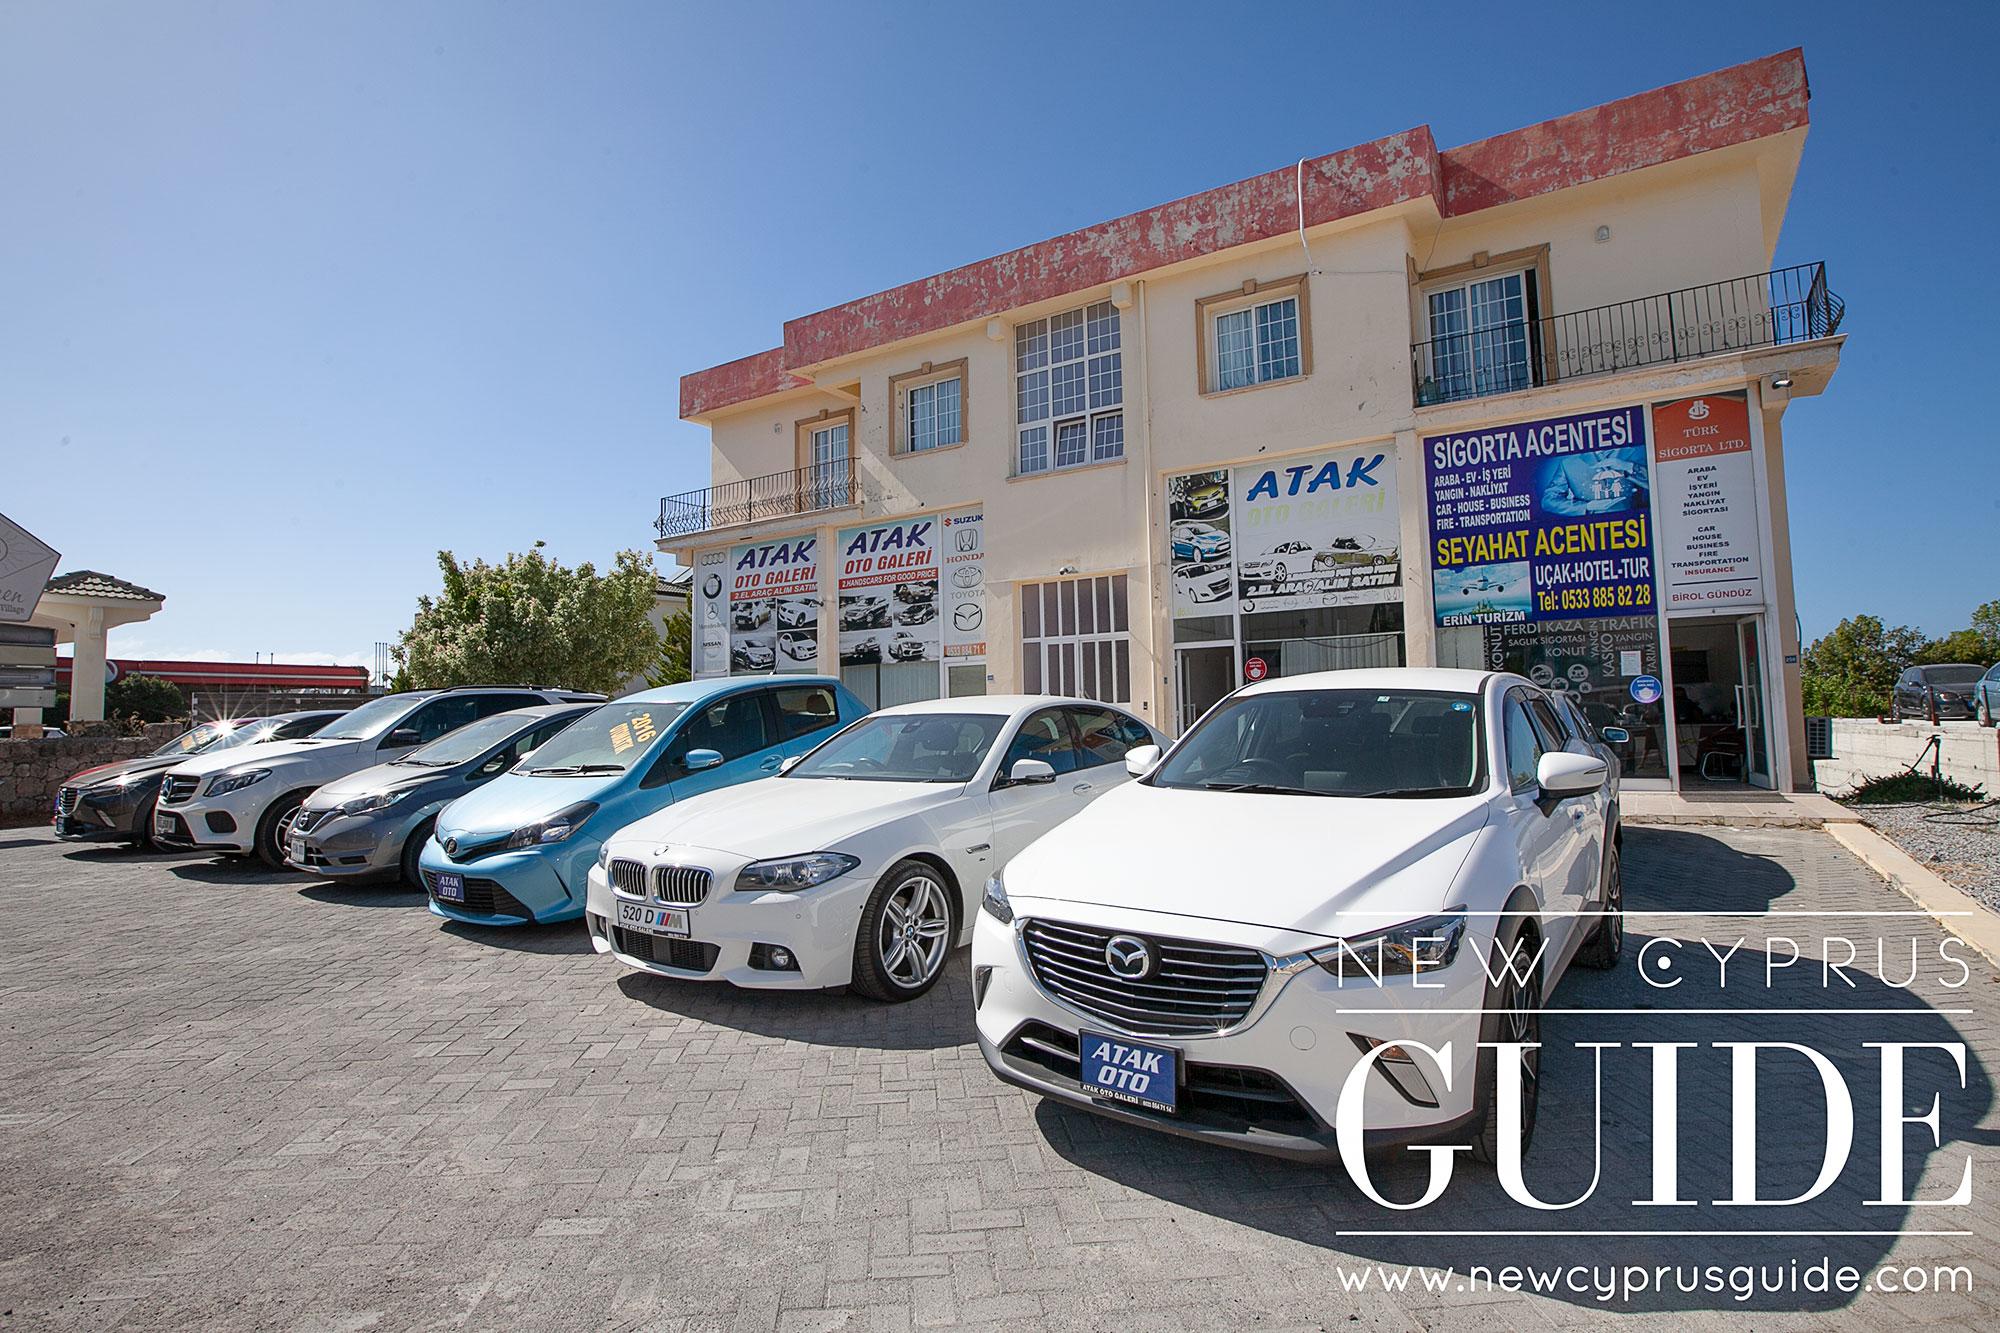 Atak Oto Gallery - New Cyprus Guide